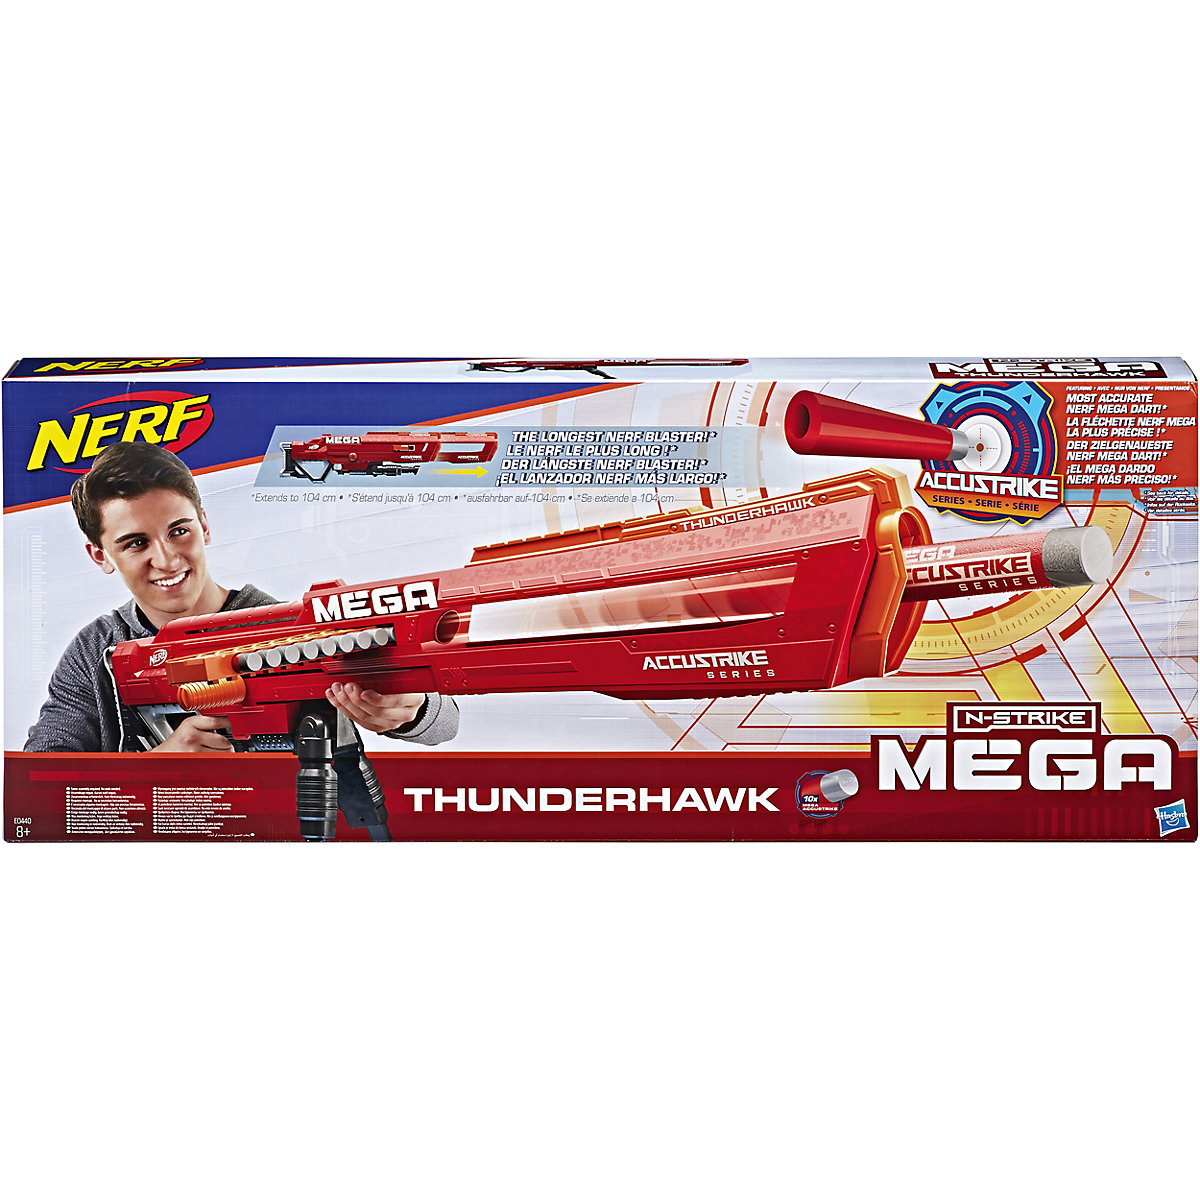 NERF jouet pistolets 8376449 pistolet arme jouets jeux pneumatique blaster garçon orbiz revolver plein air plaisir sport MTpromo